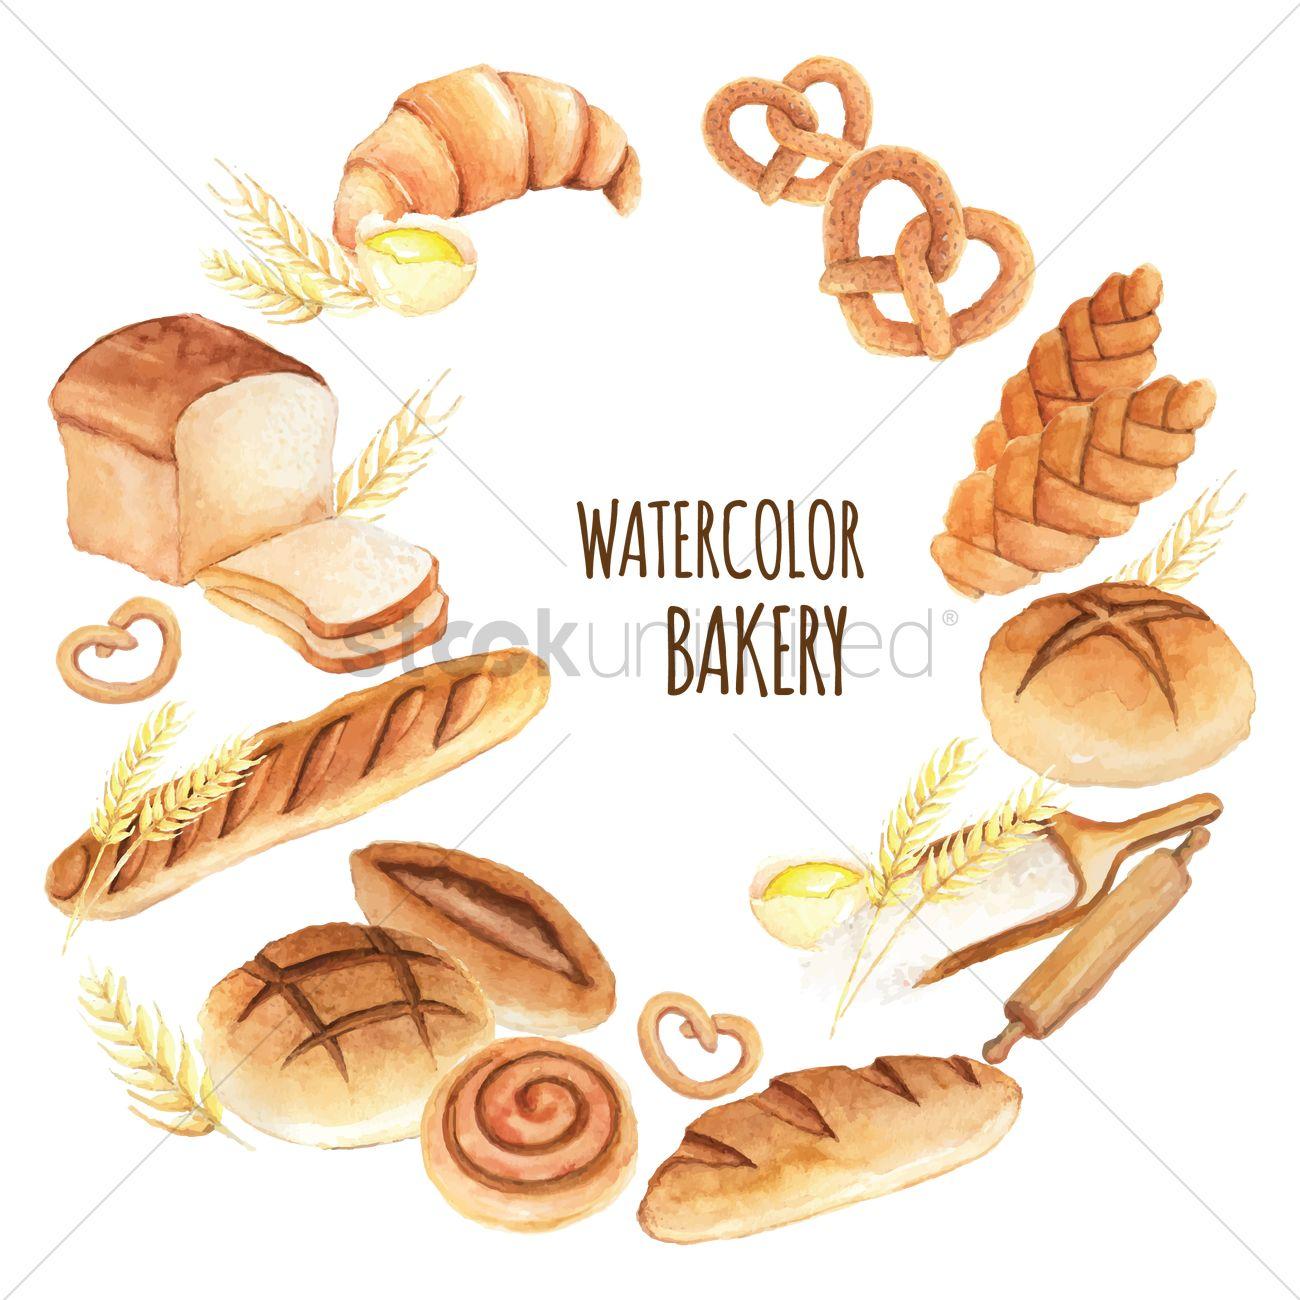 watercolor bakery icon set_1812214